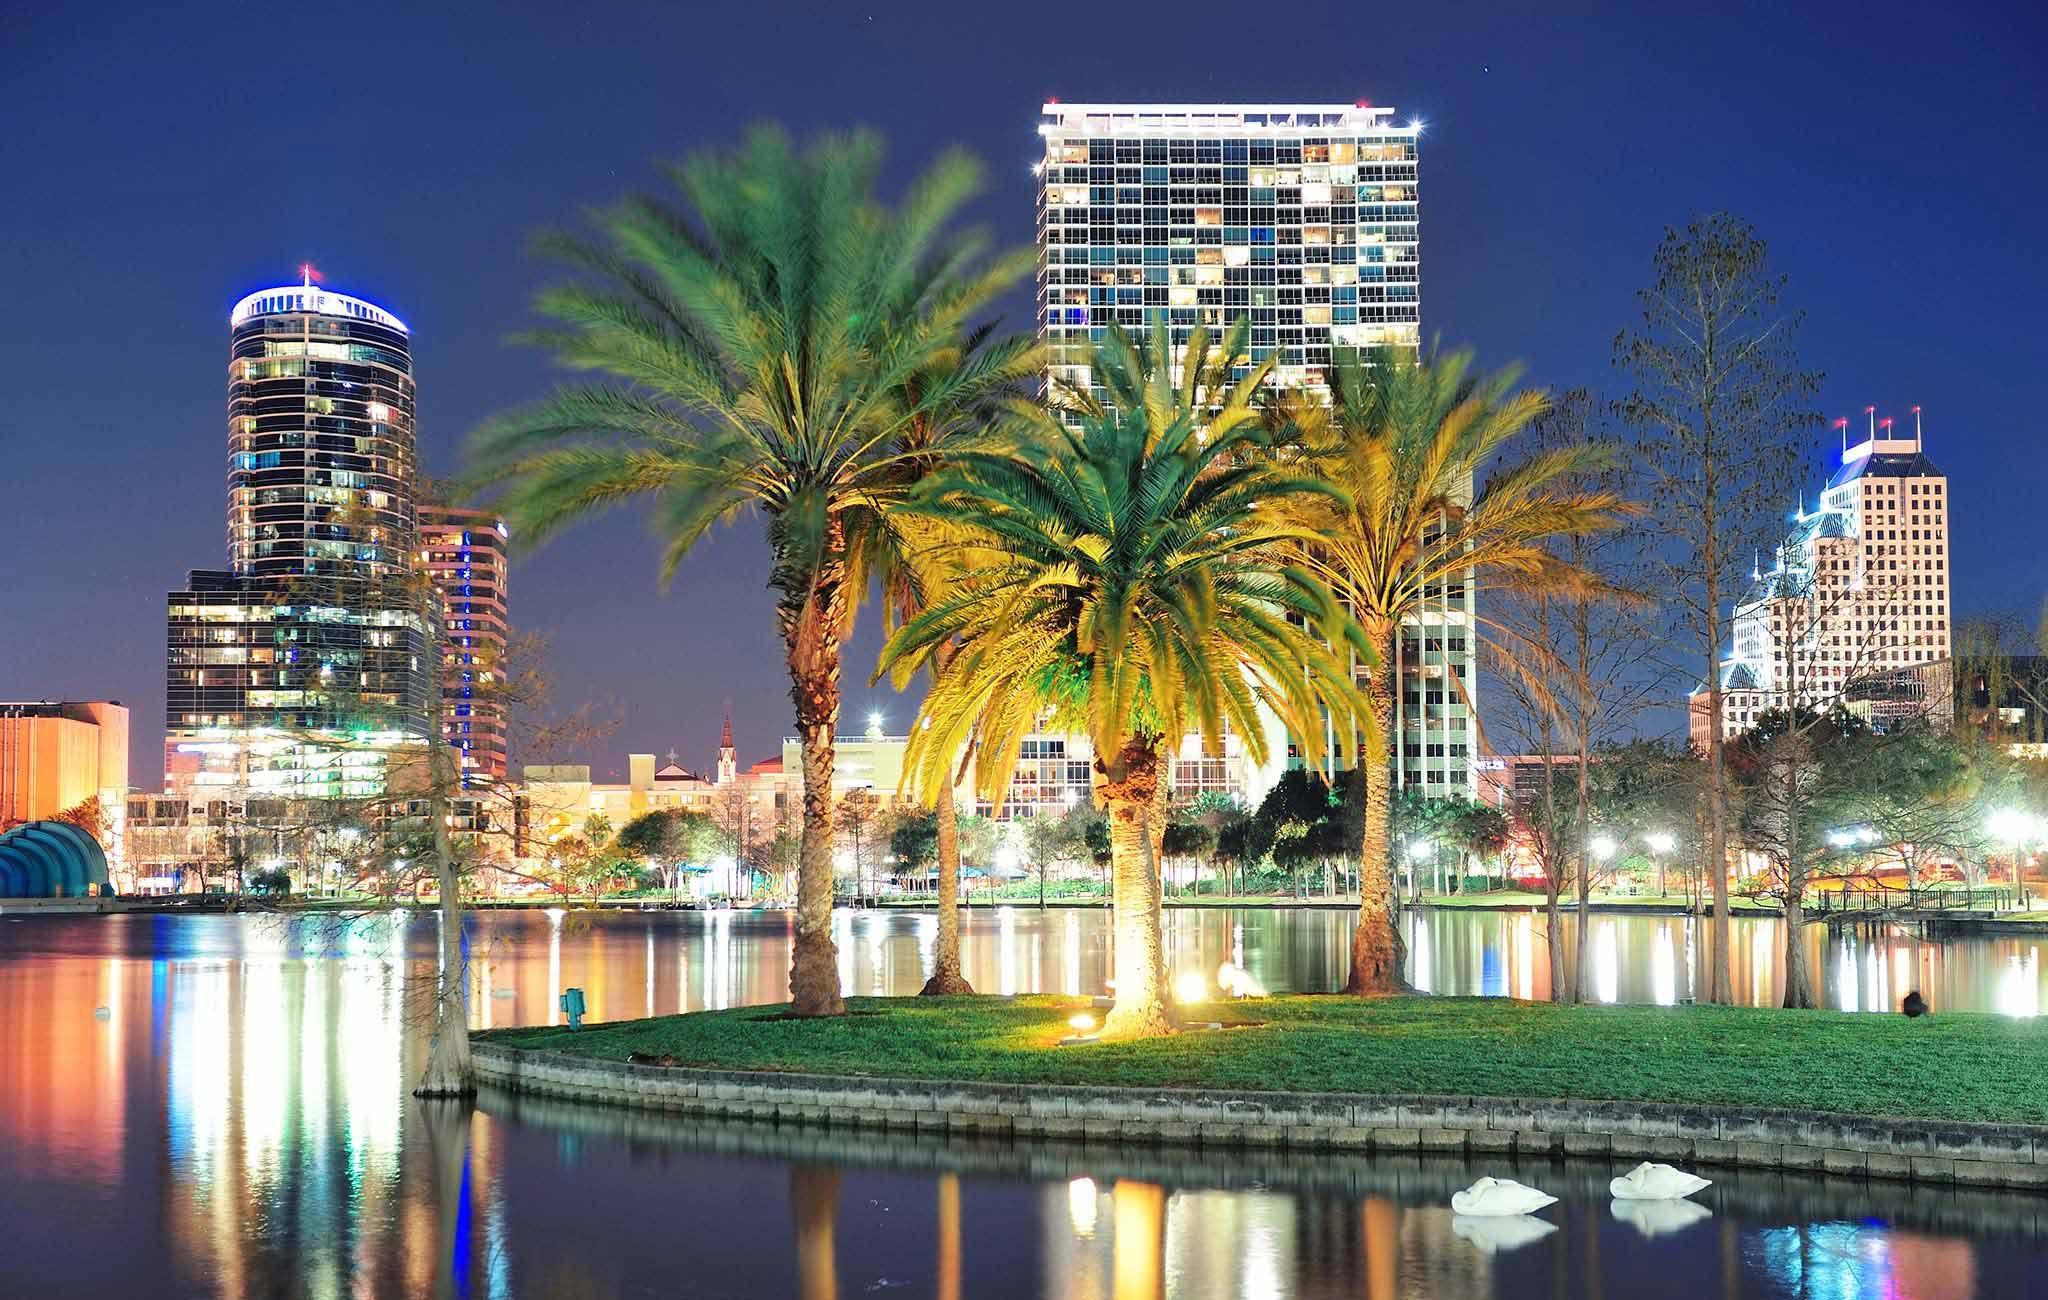 406857-Orlando